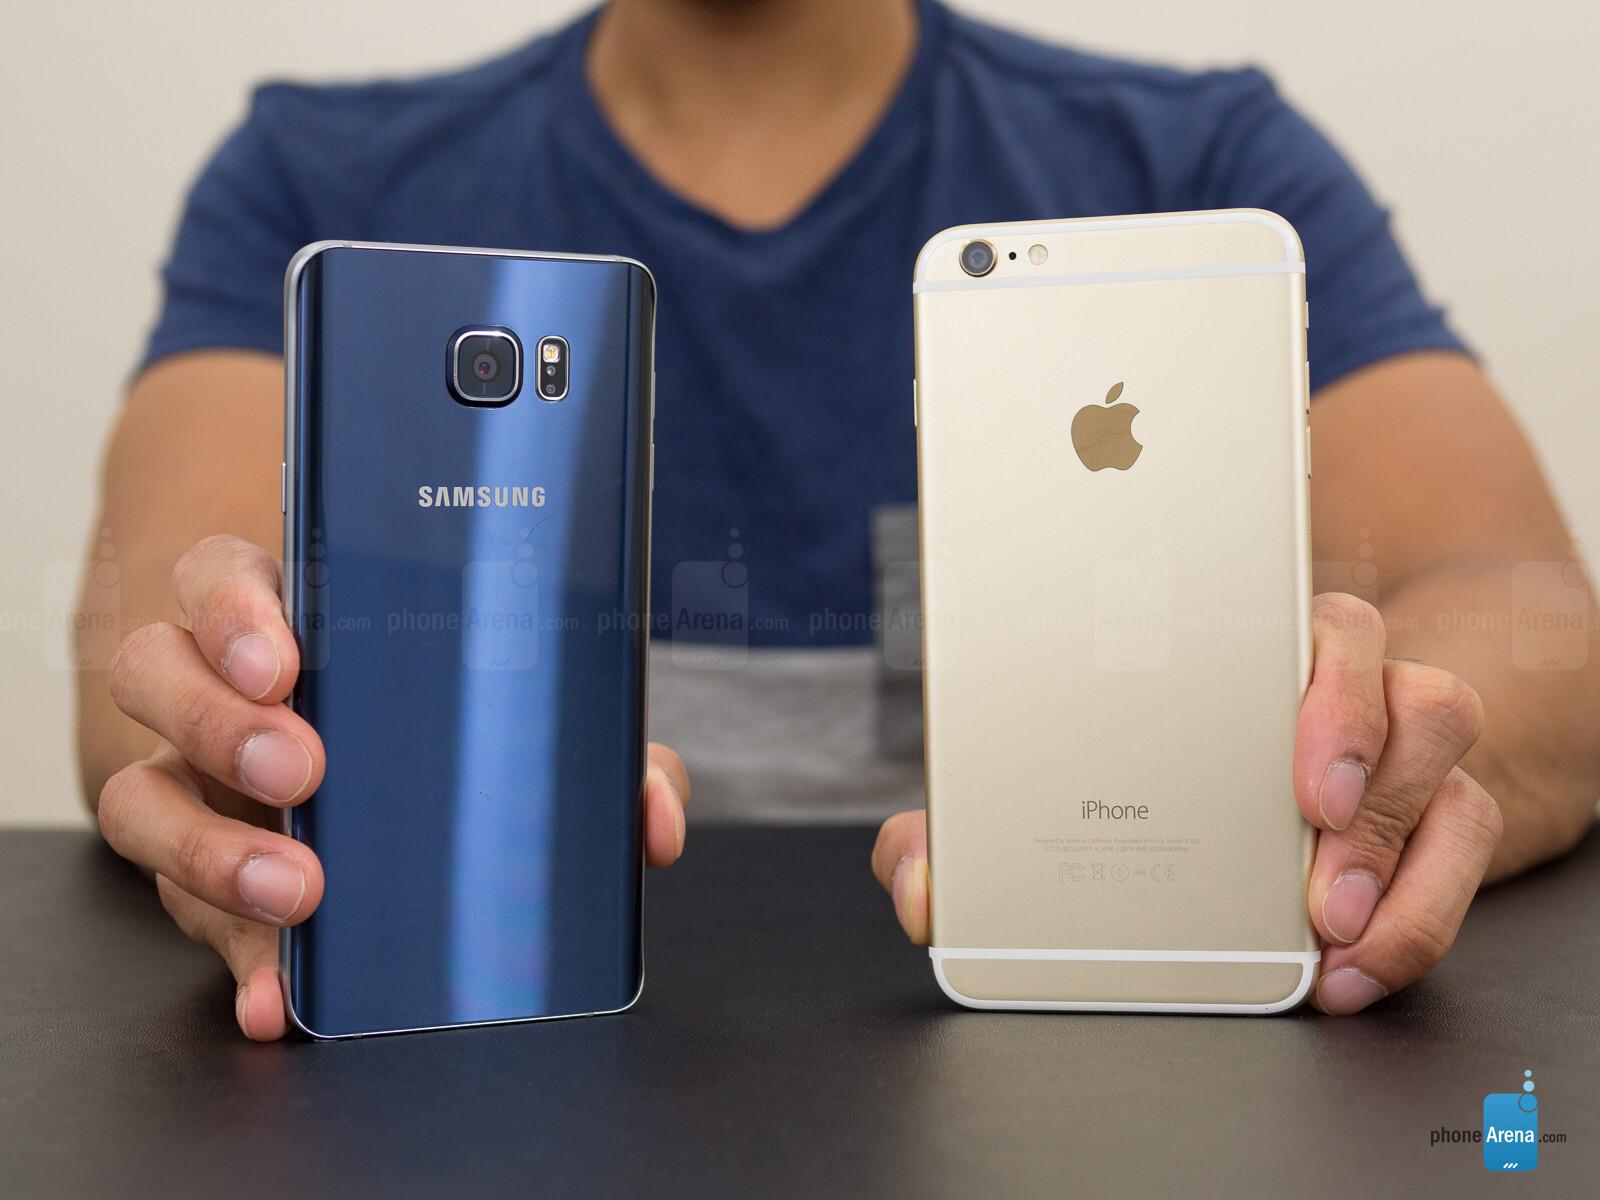 Samsung Galaxy Note5 vs Apple iPhone 6 Plus - Call quality fb4386143c6